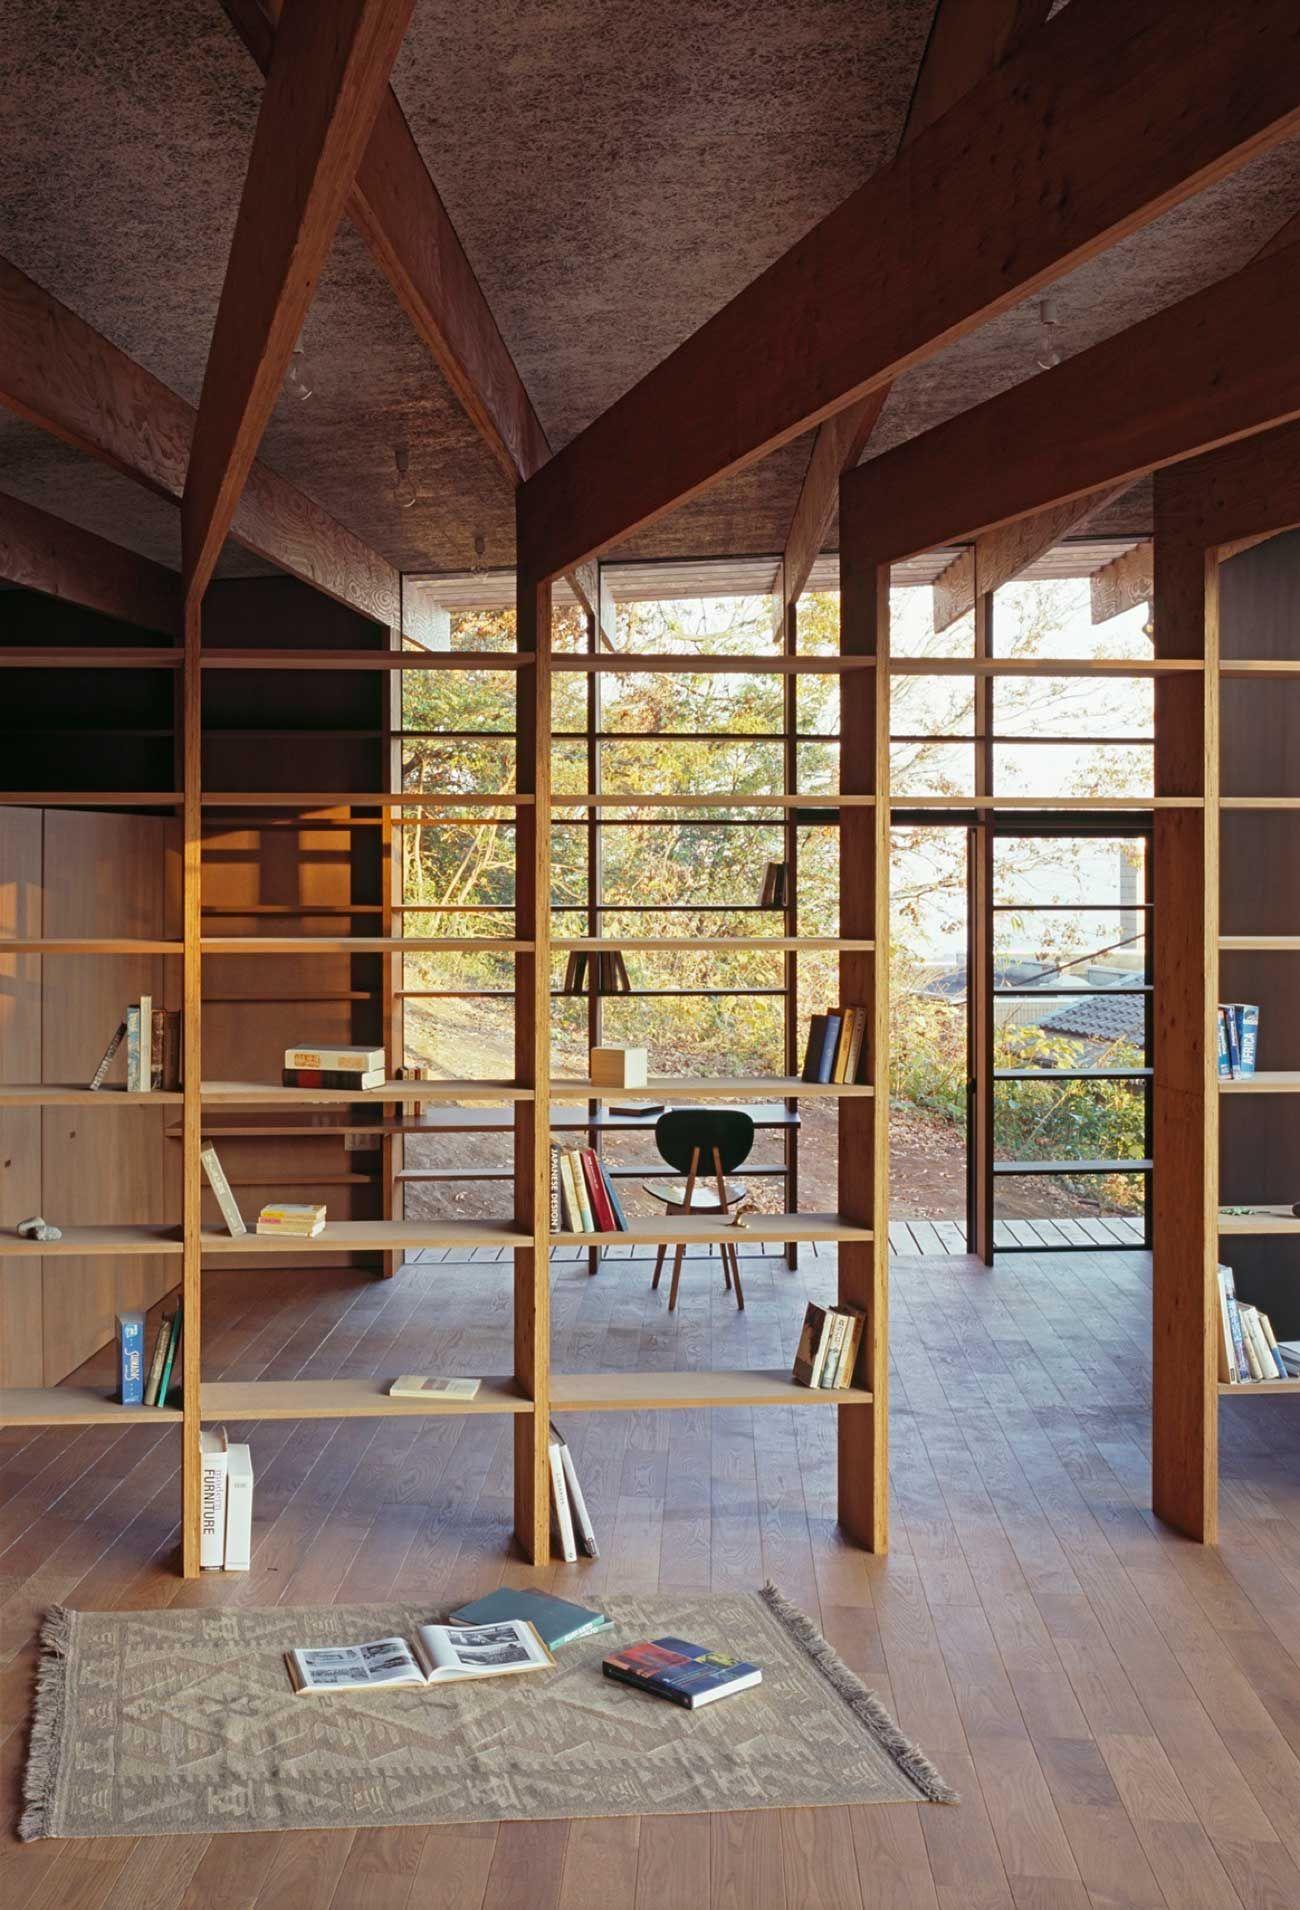 Geo metria by mount fuji architects studio japan fuji architects